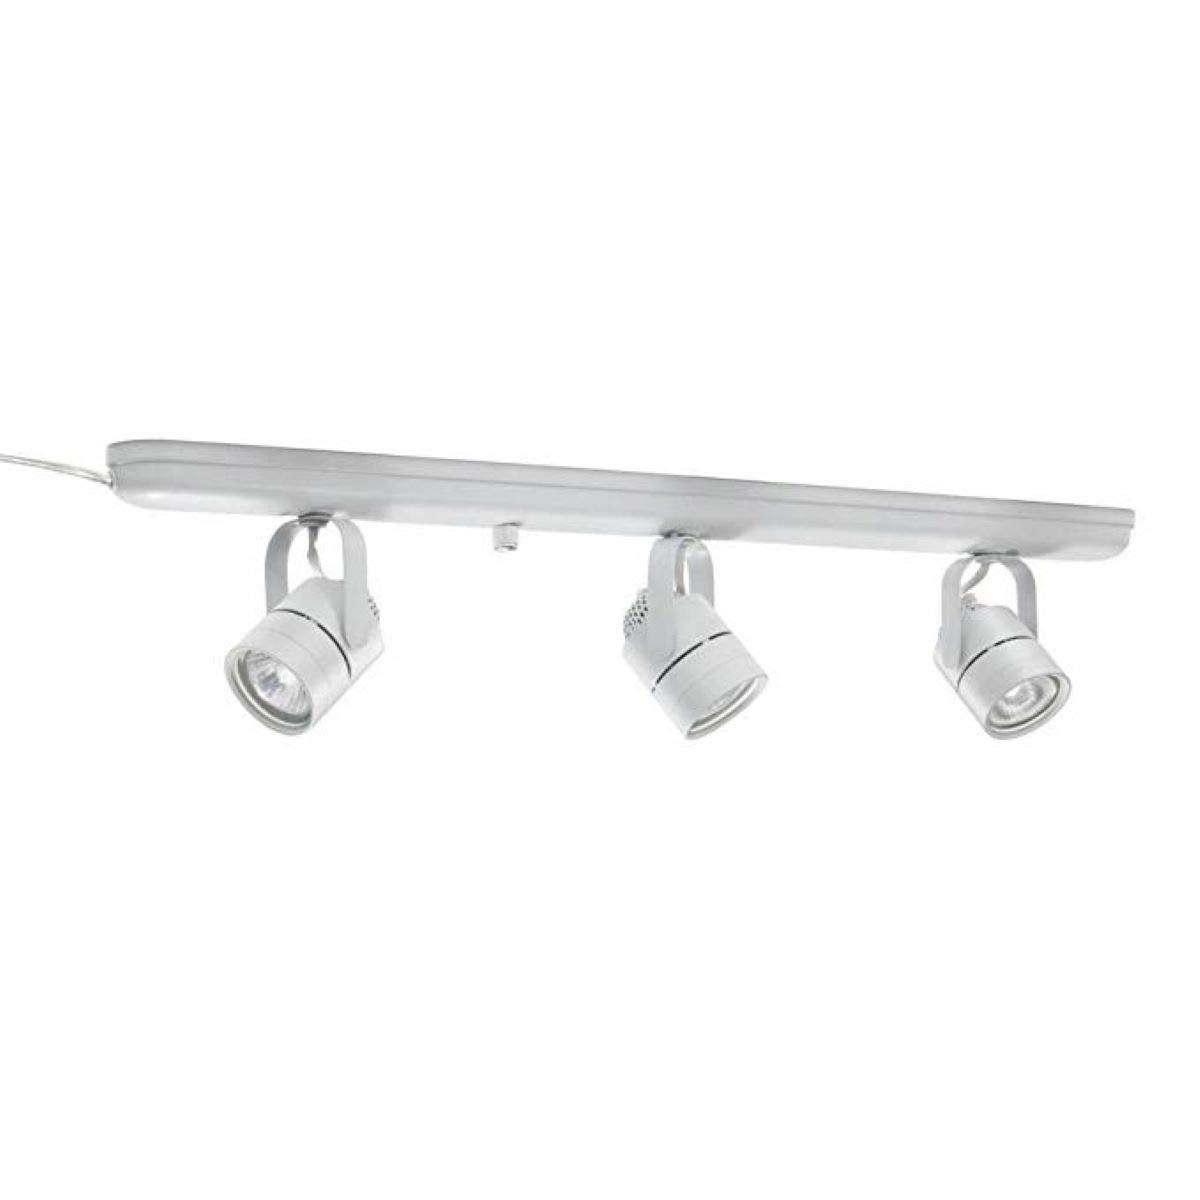 Lithonia lighting ltkmsbk mr16gu10 3l mw m4 mesh back 3 light halogen track lighting kit 27 white